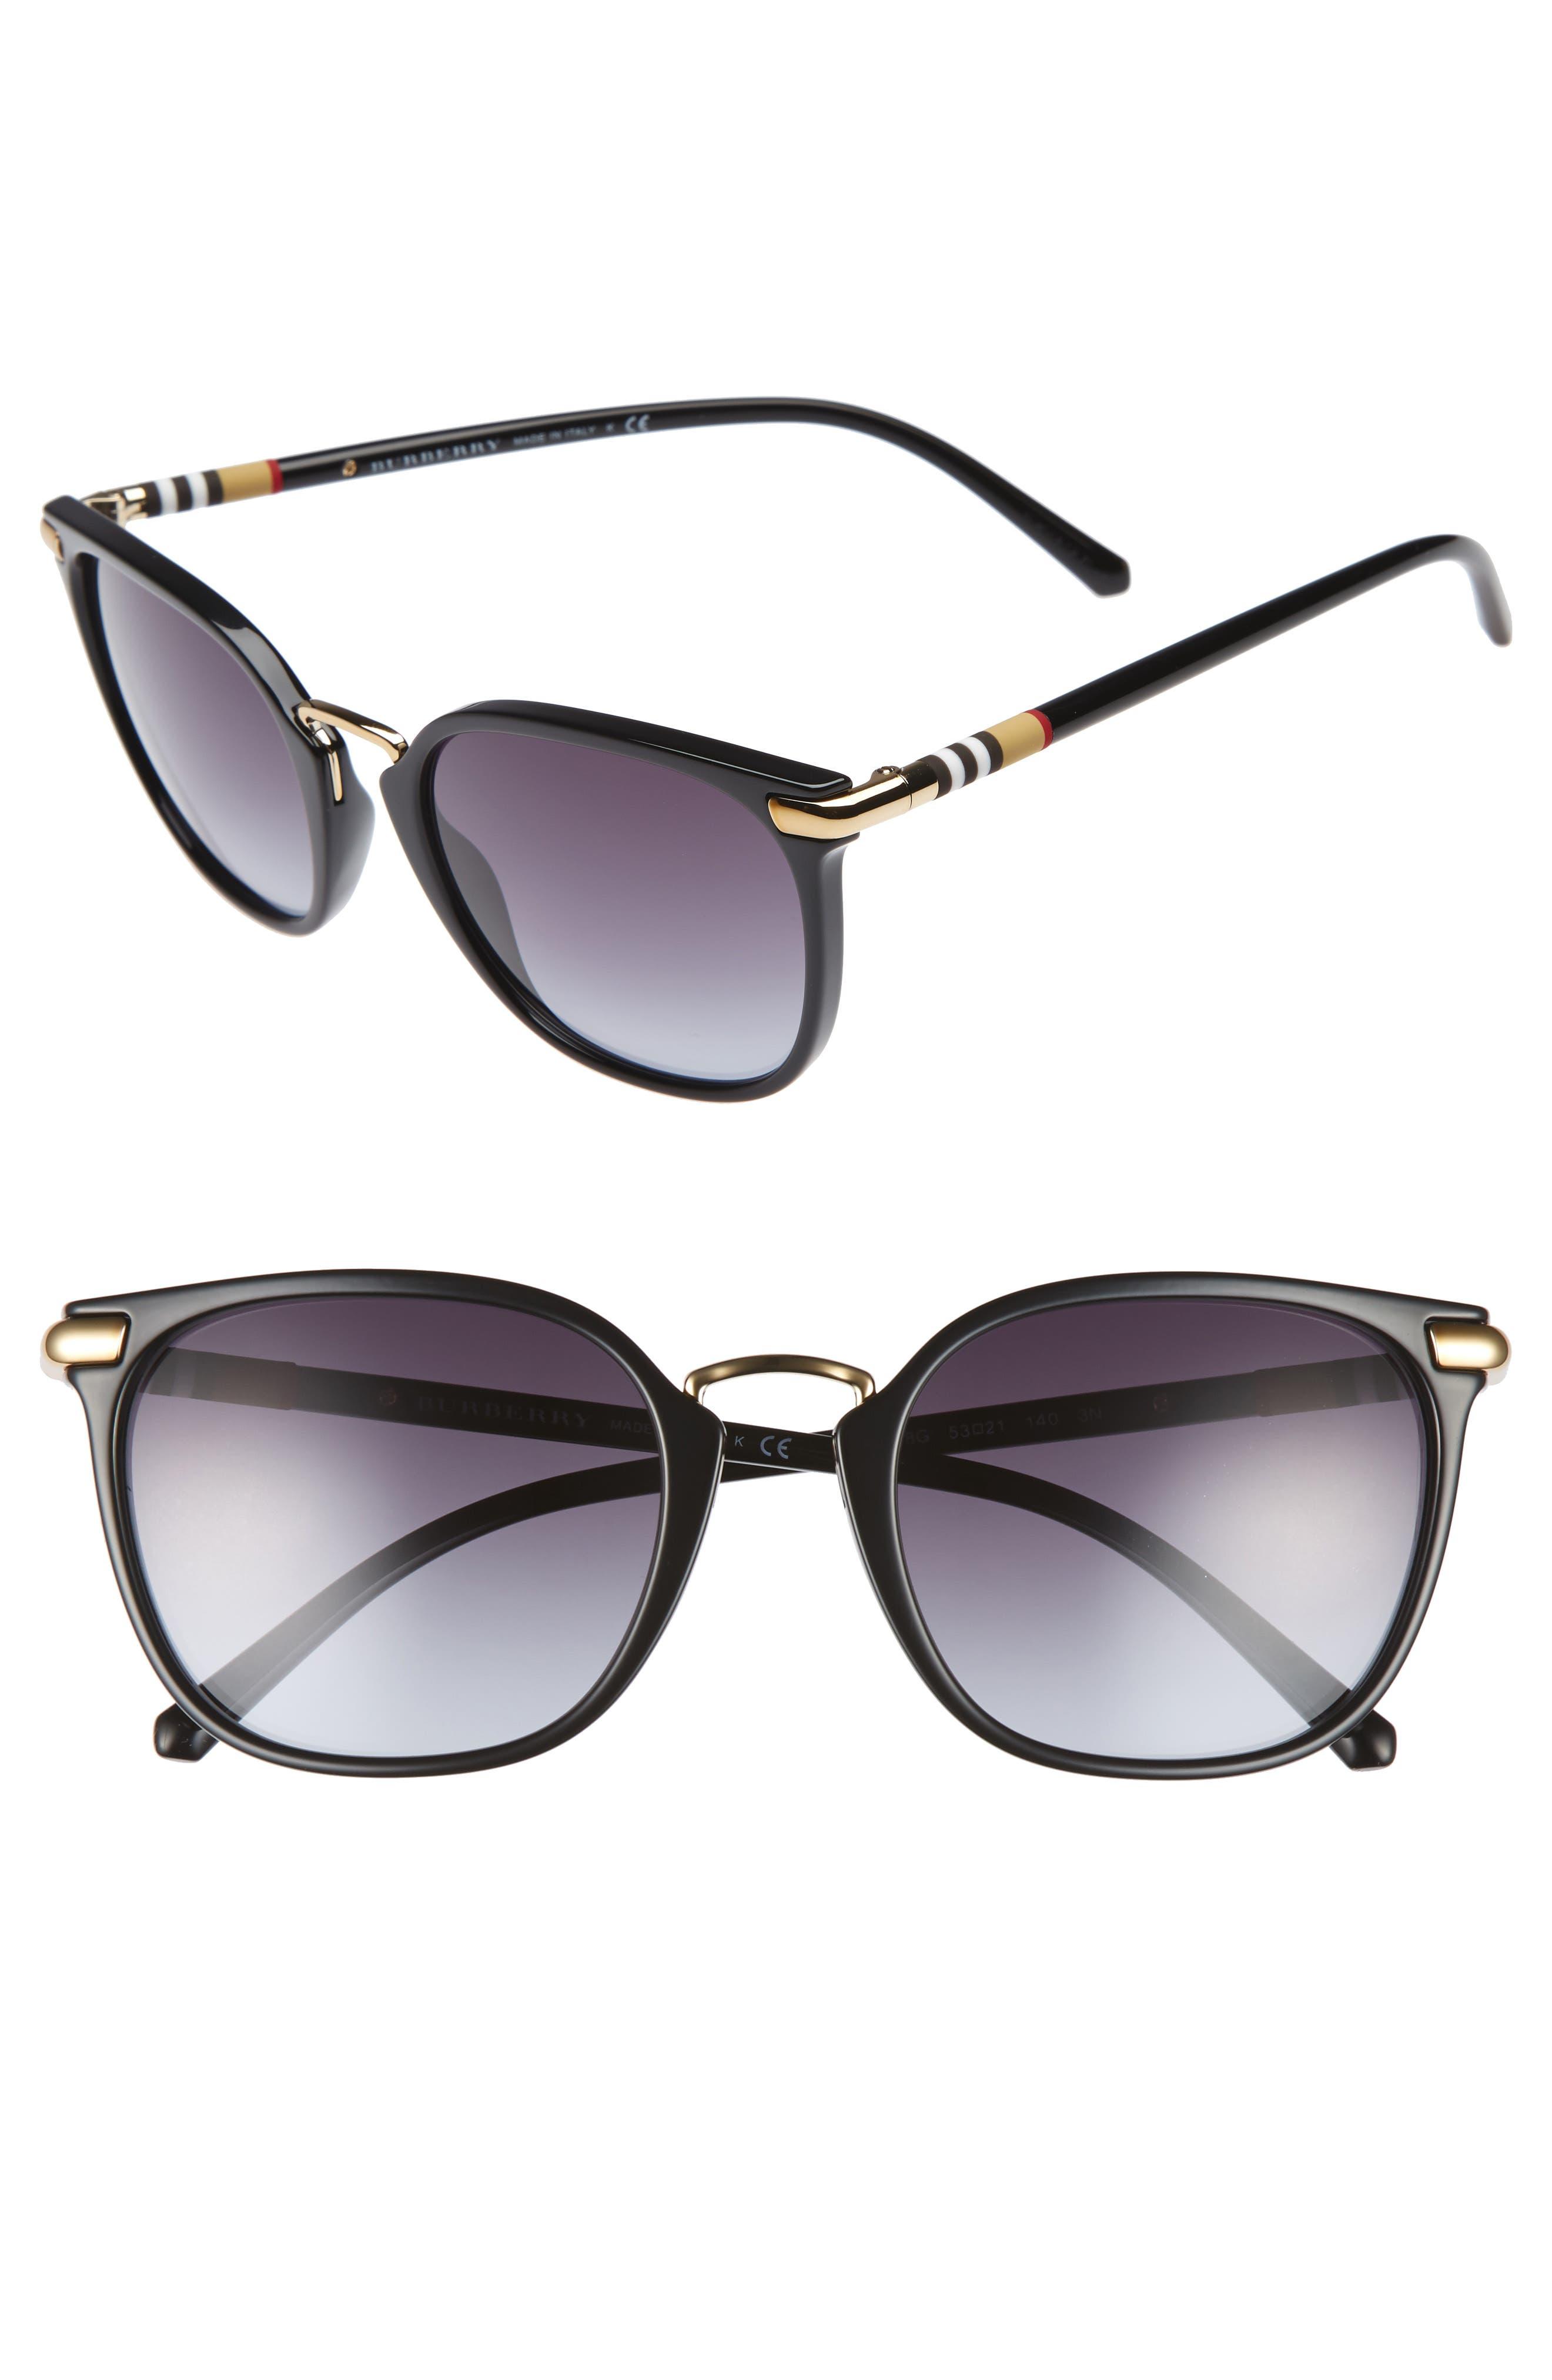 53mm Gradient Square Sunglasses,                         Main,                         color,